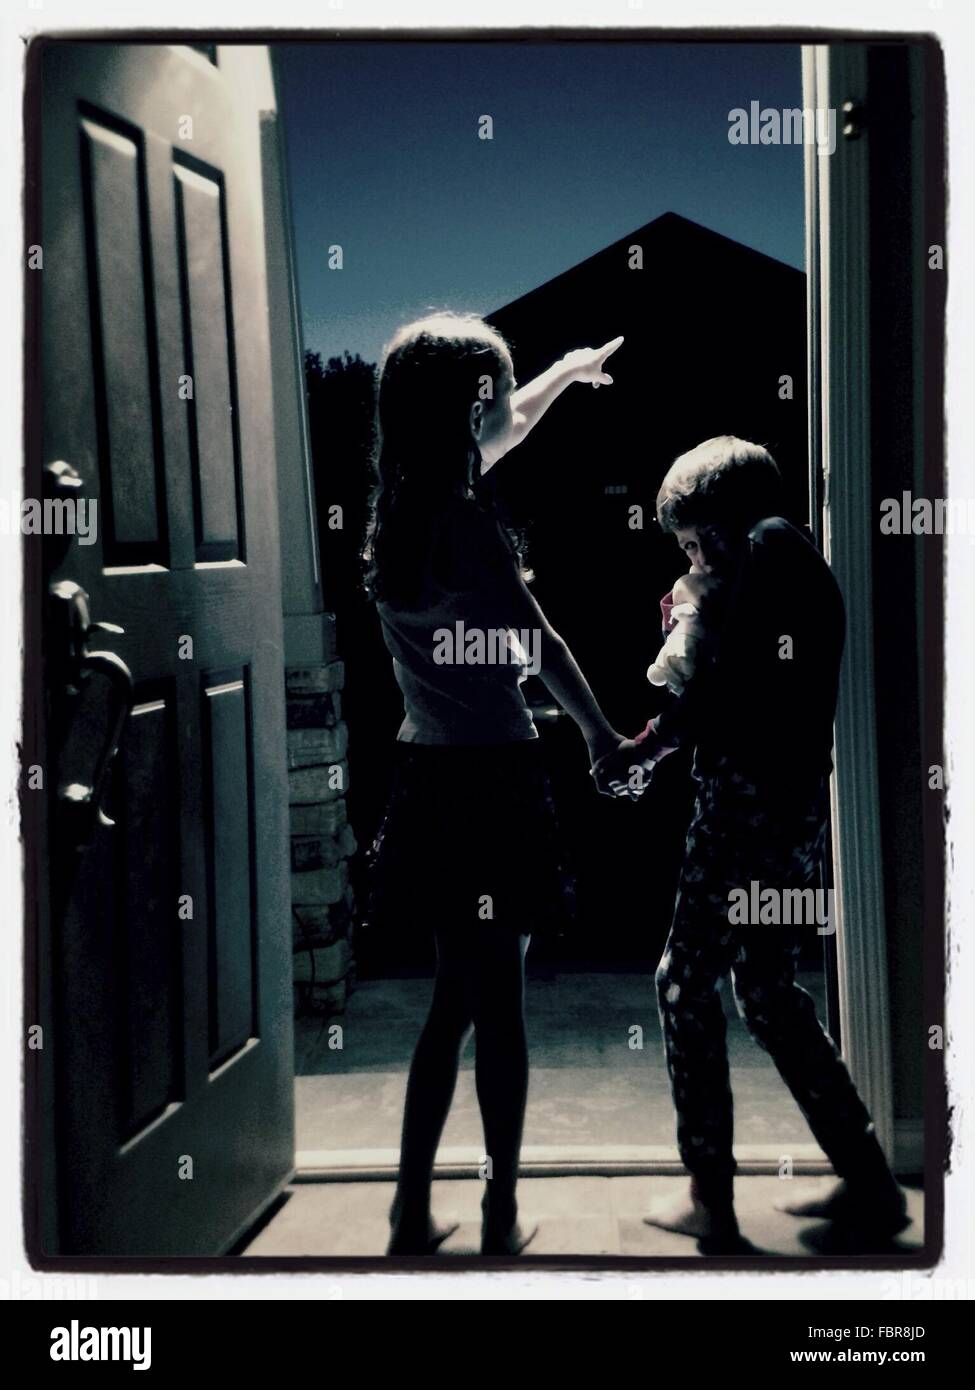 Siblings Standing On Door At Night - Stock Image